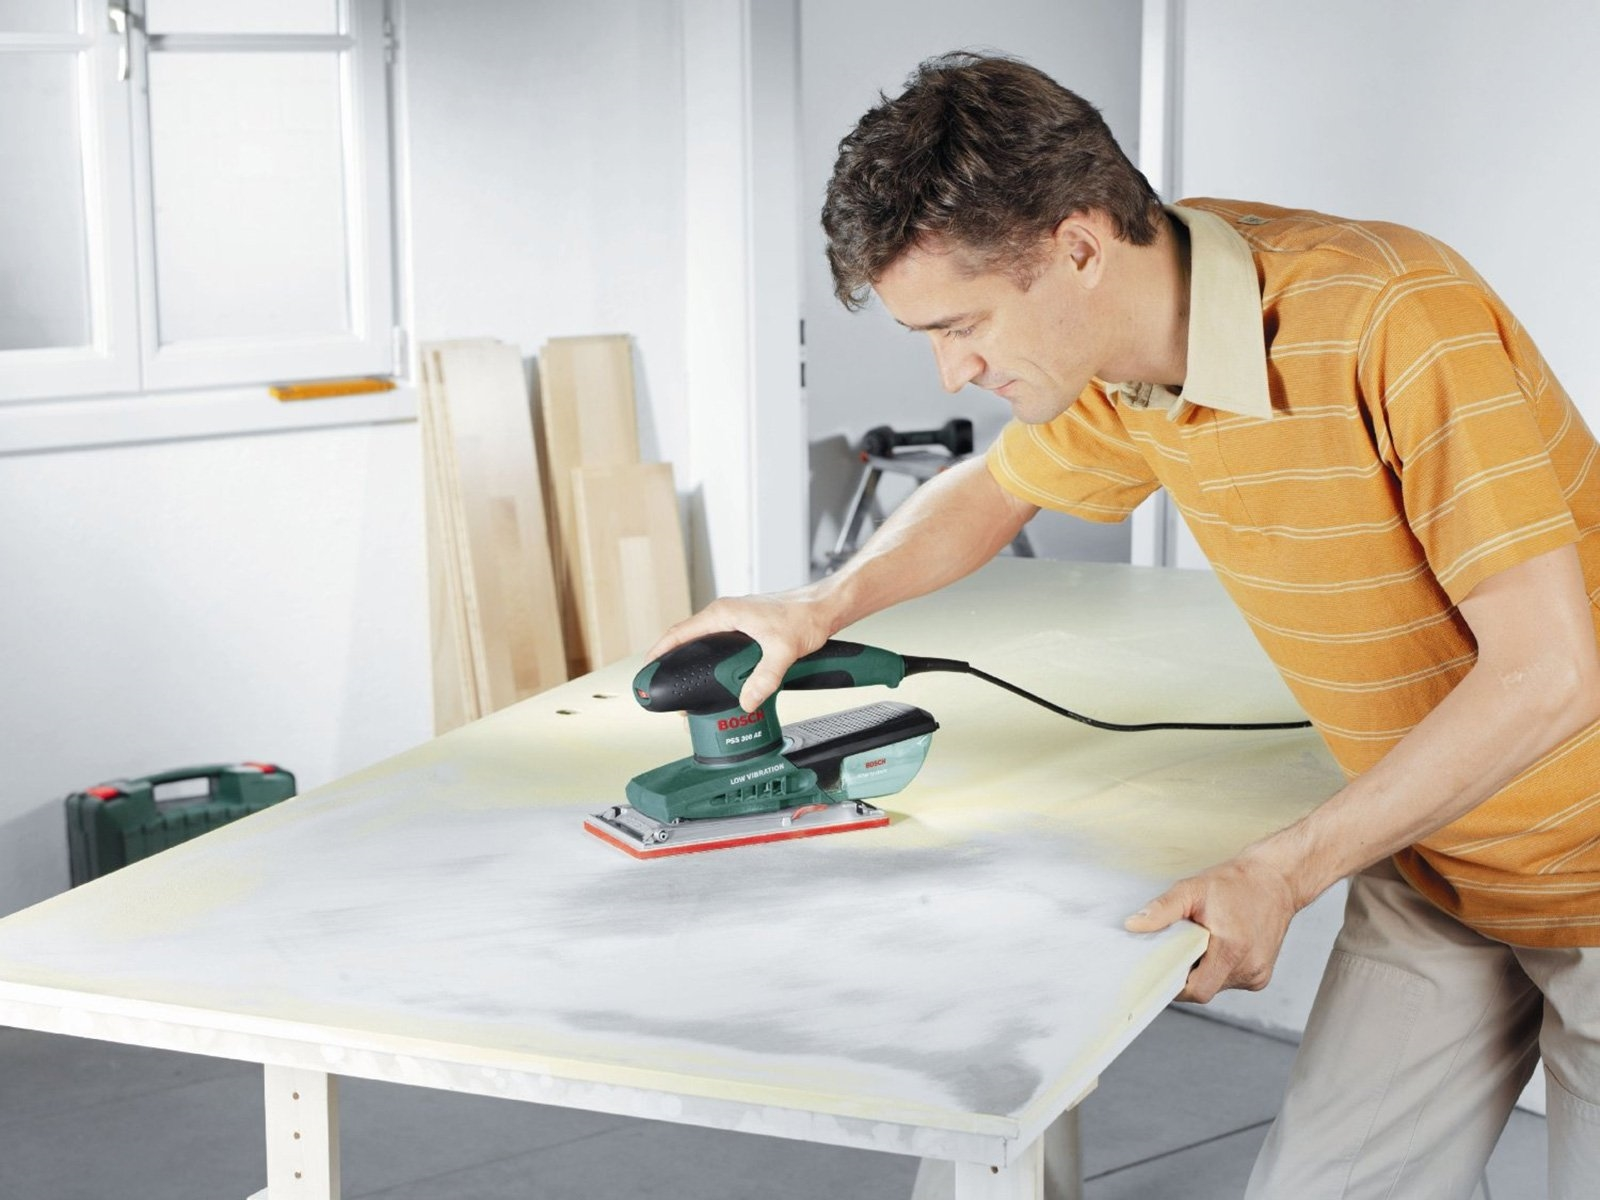 мужчина ремонтирует столешницу